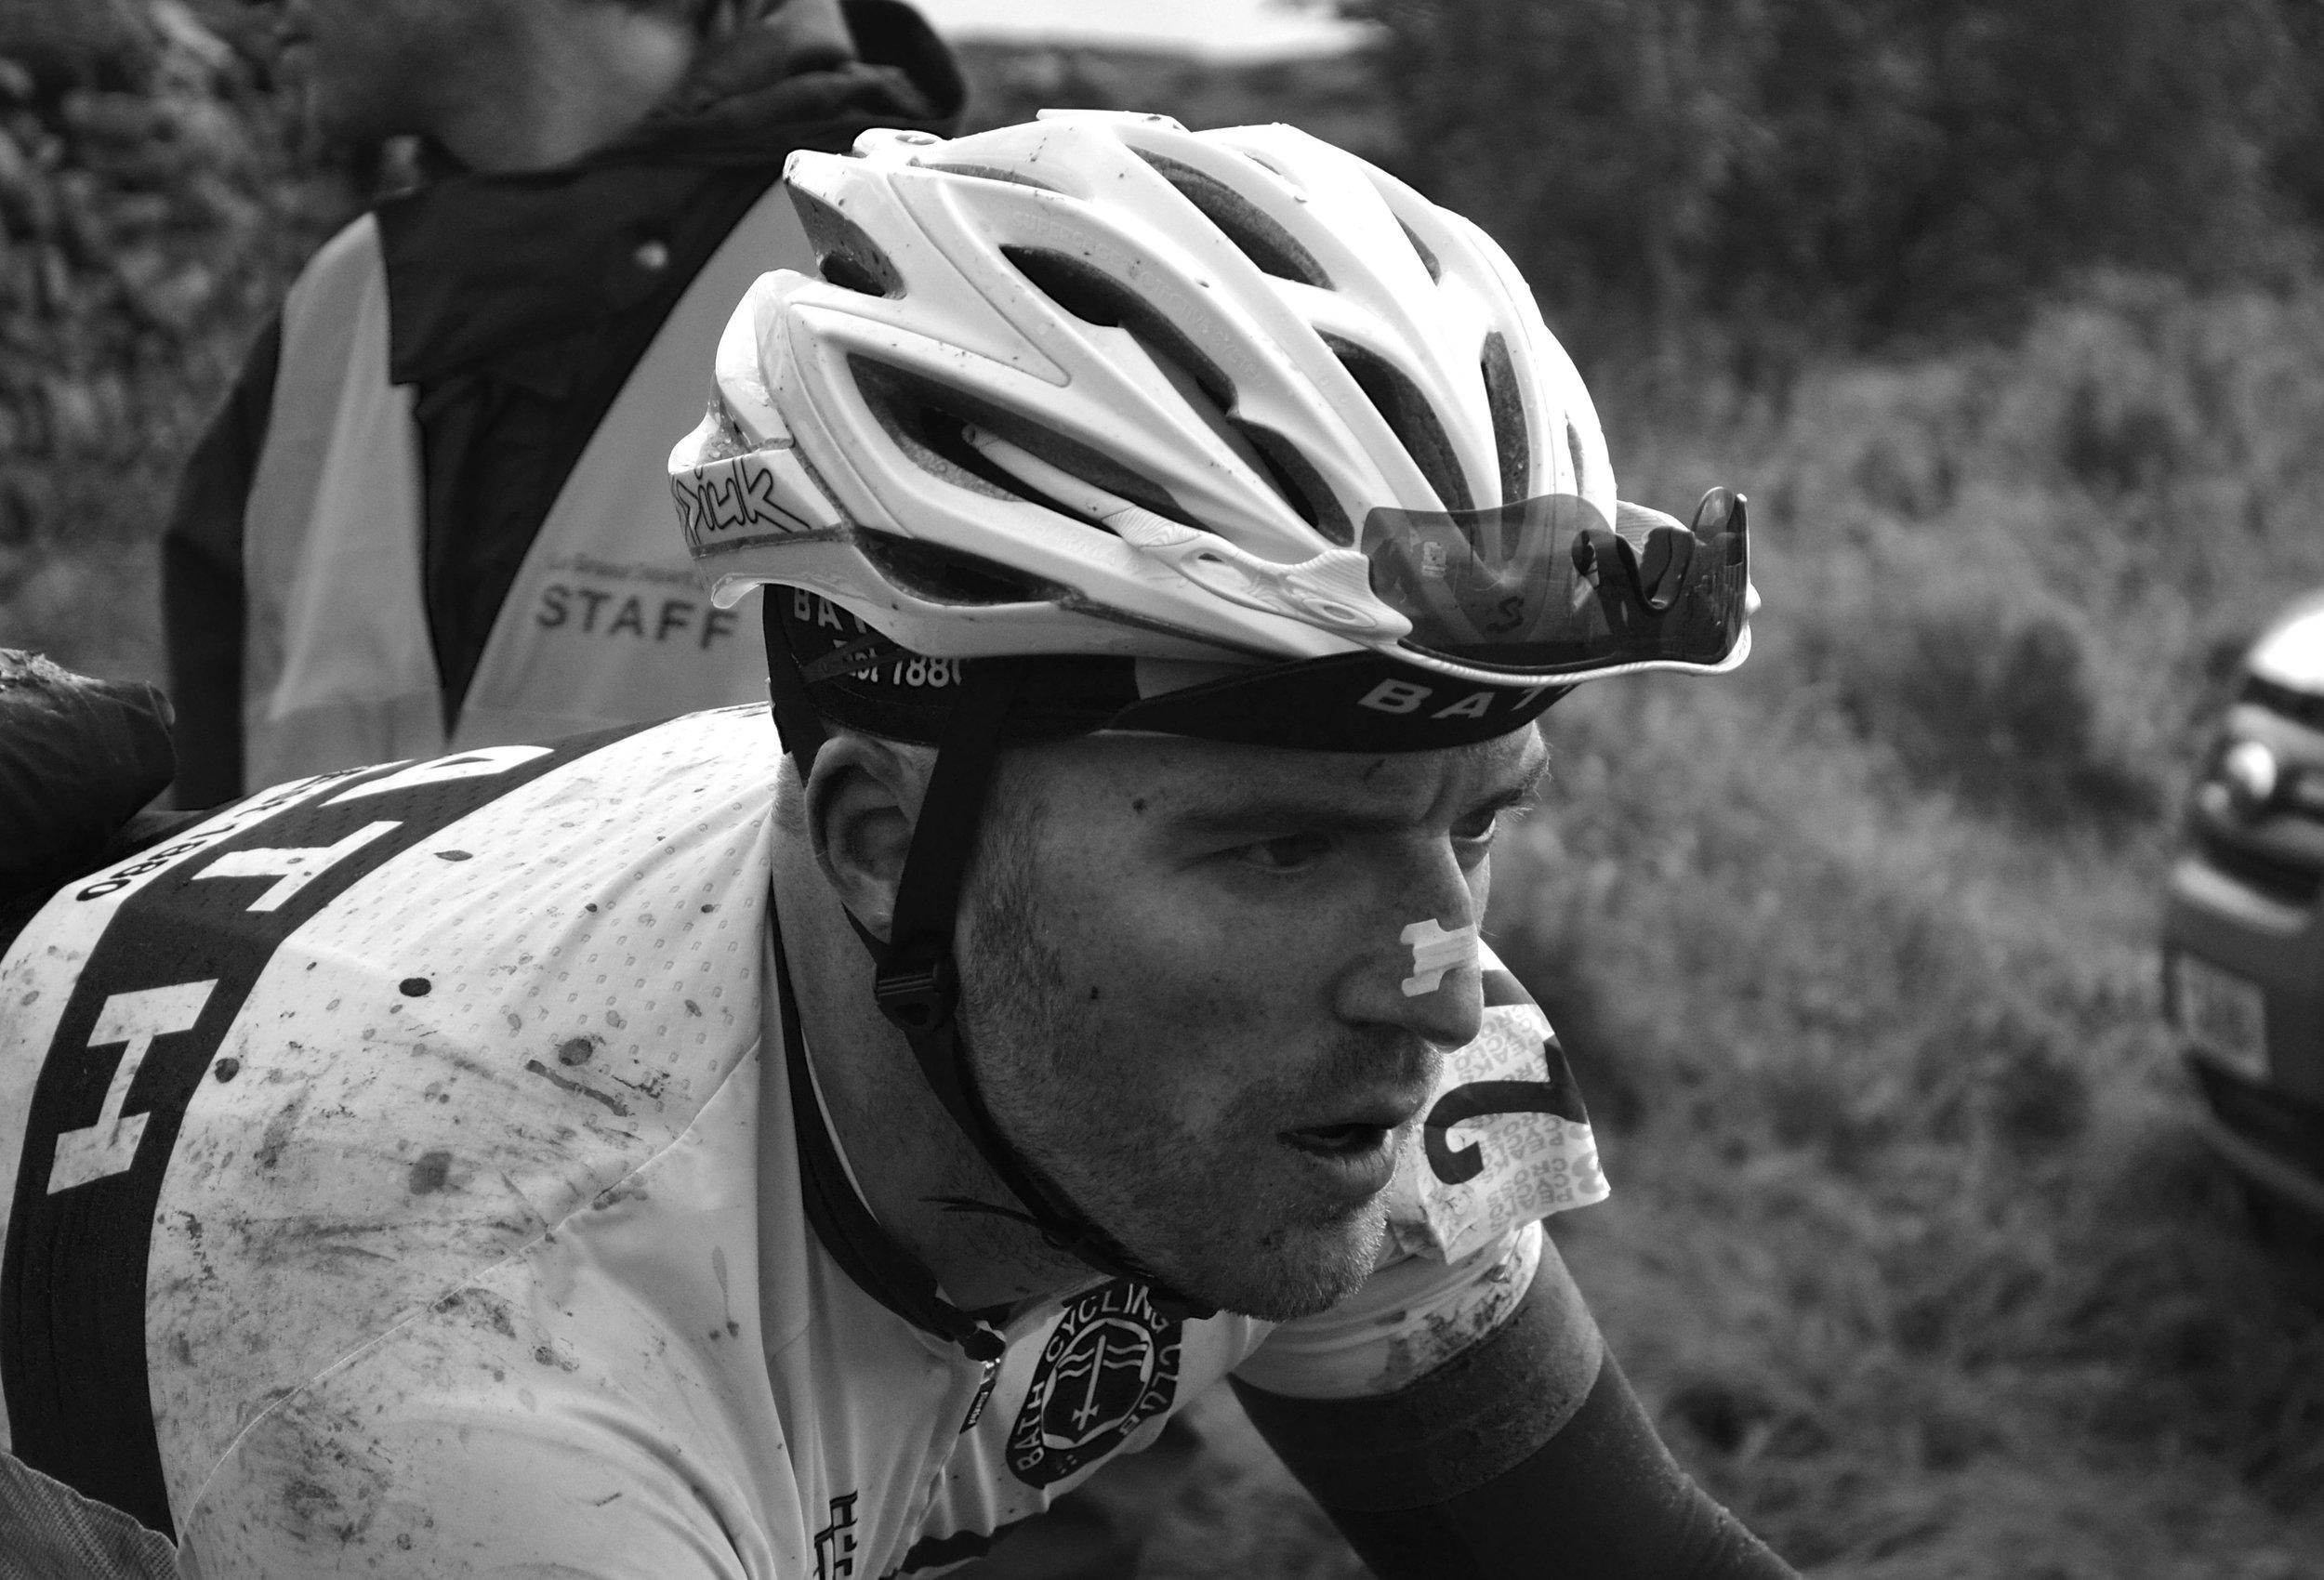 3 Peaks Cyclo-Cross Race 2016